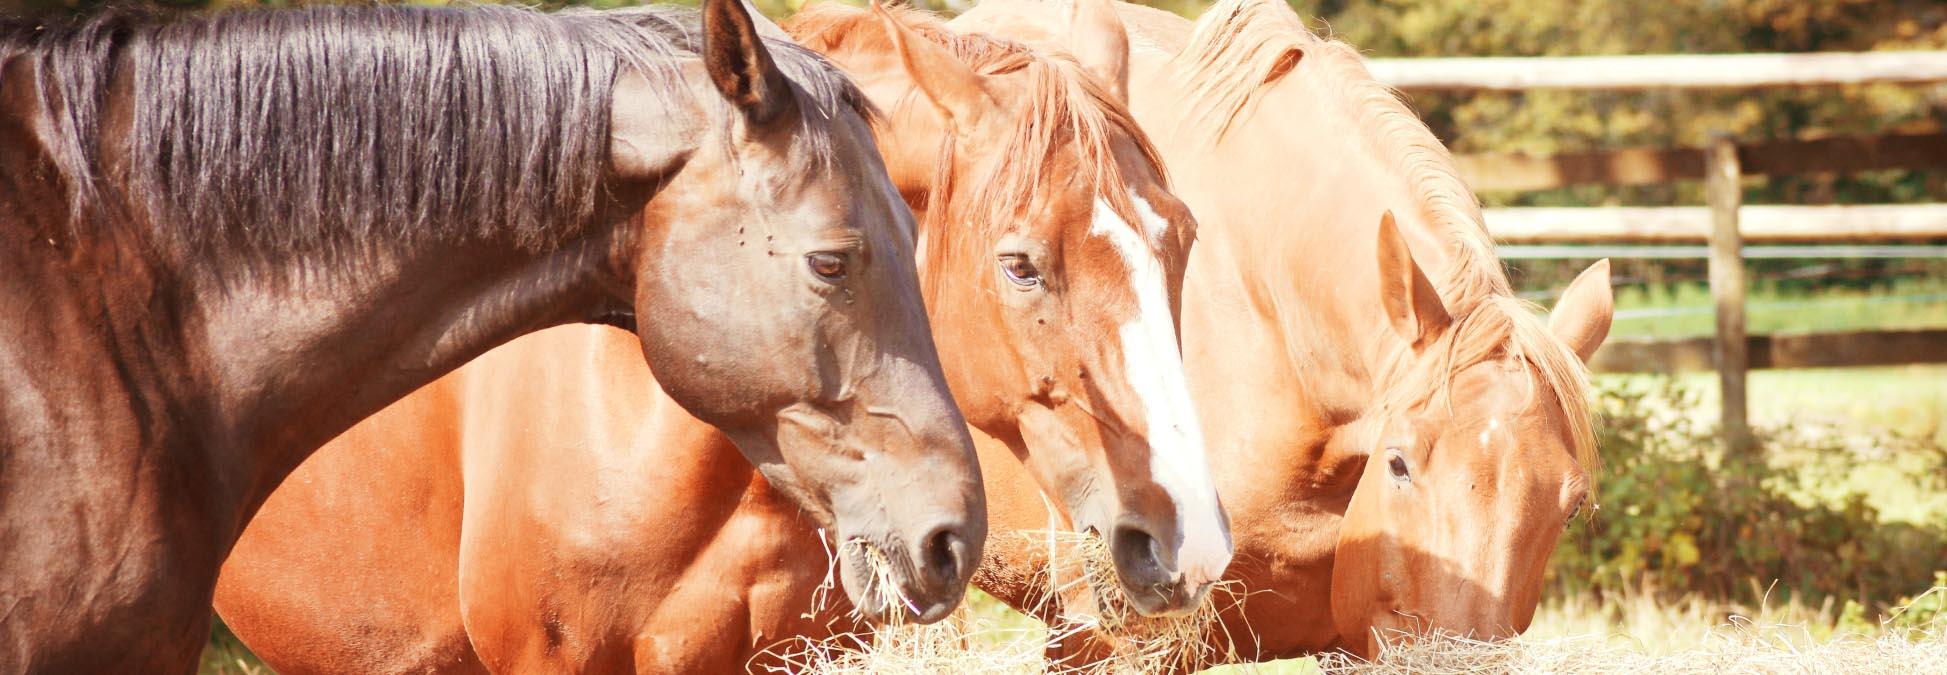 revue de presse association sauvegarde animaux